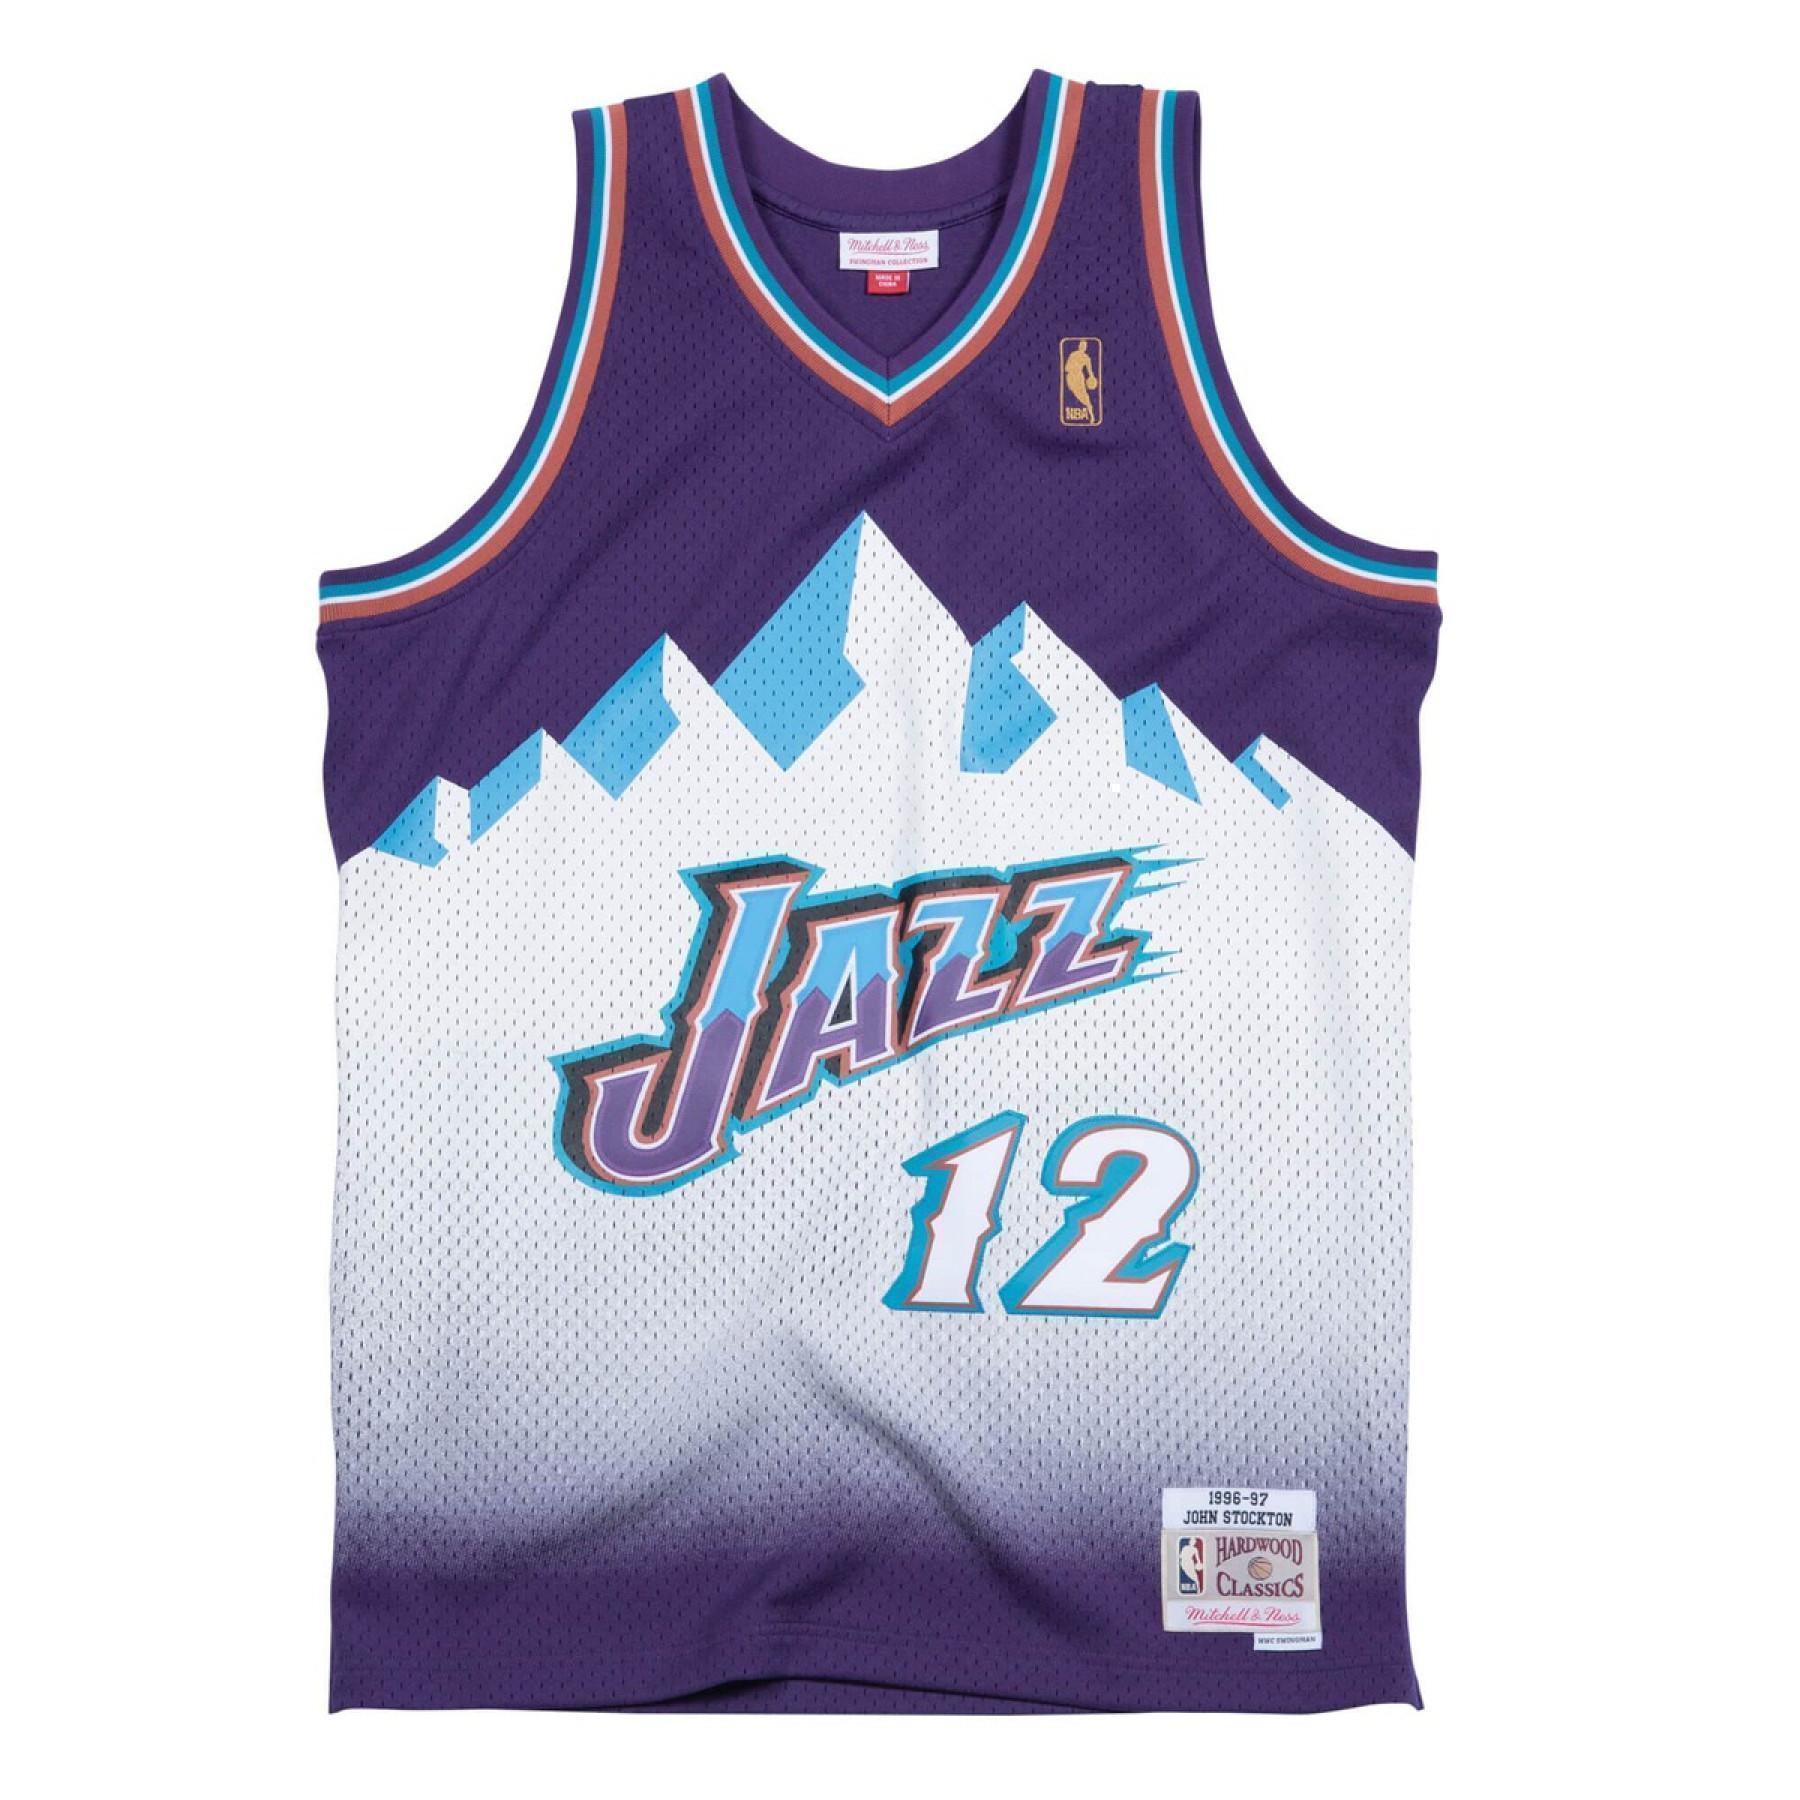 Utah Jazz John Stockton Jersey